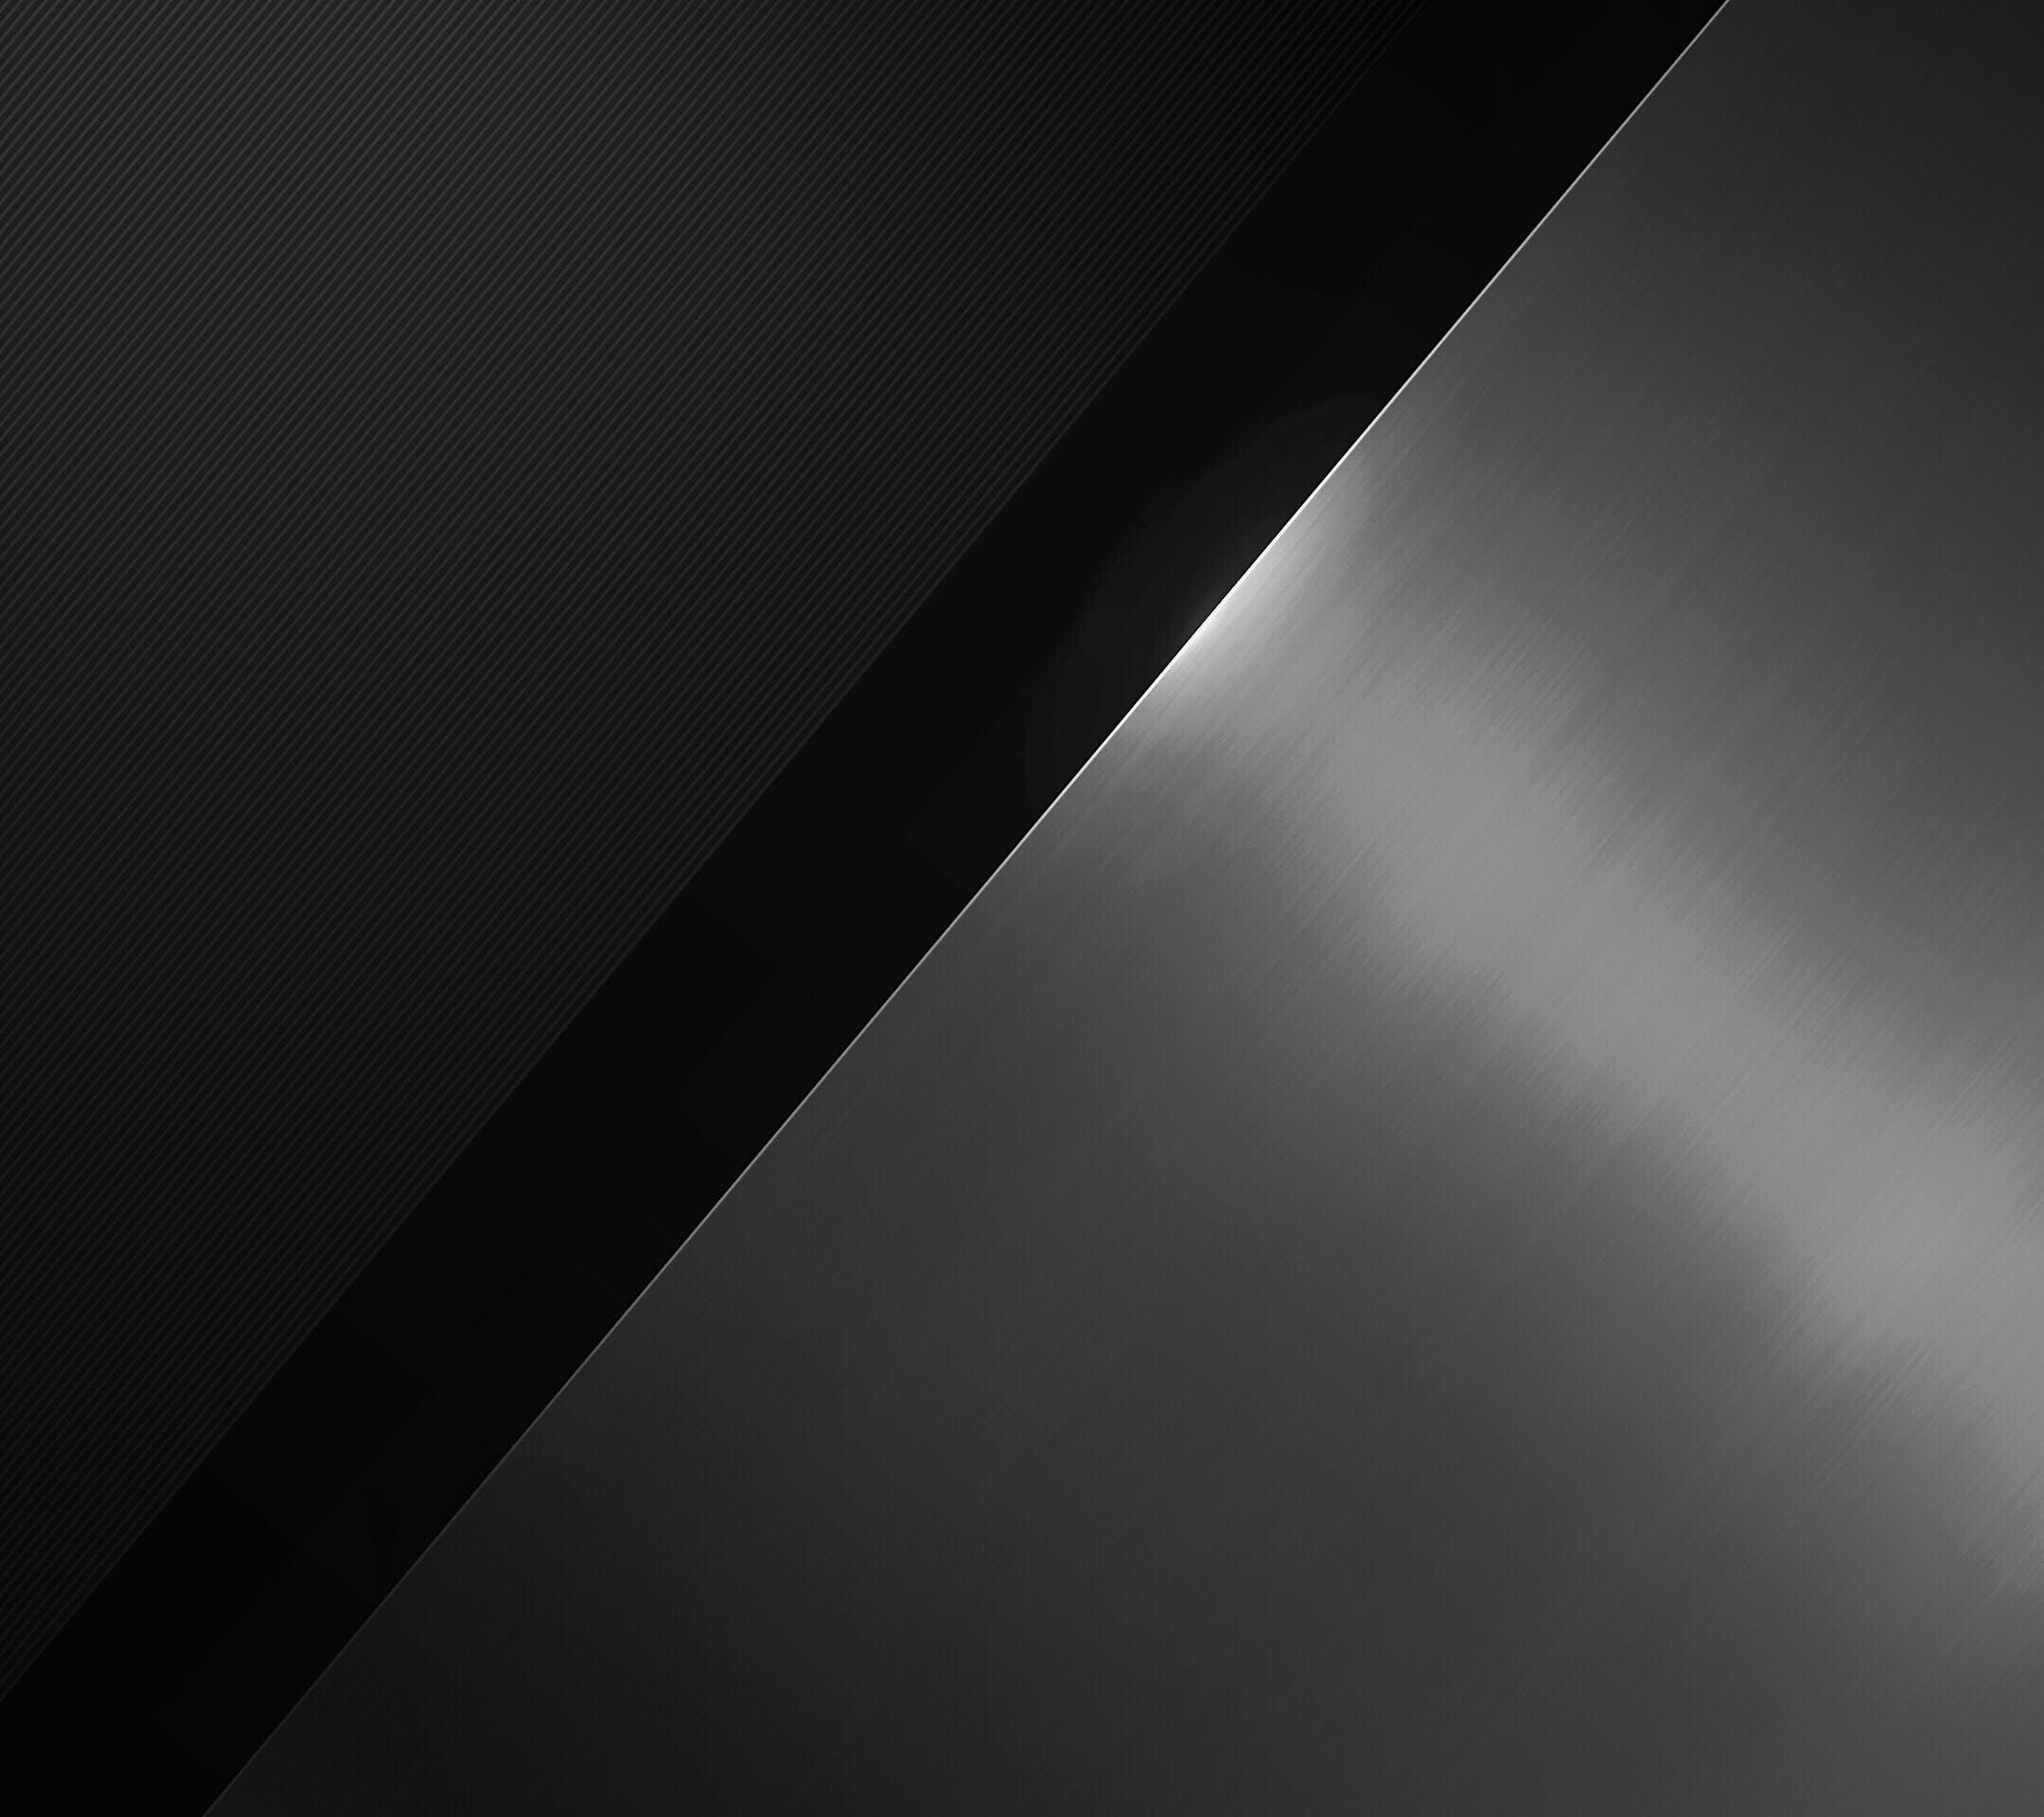 Free stock photo of flat, metallic, silver, wallpaper